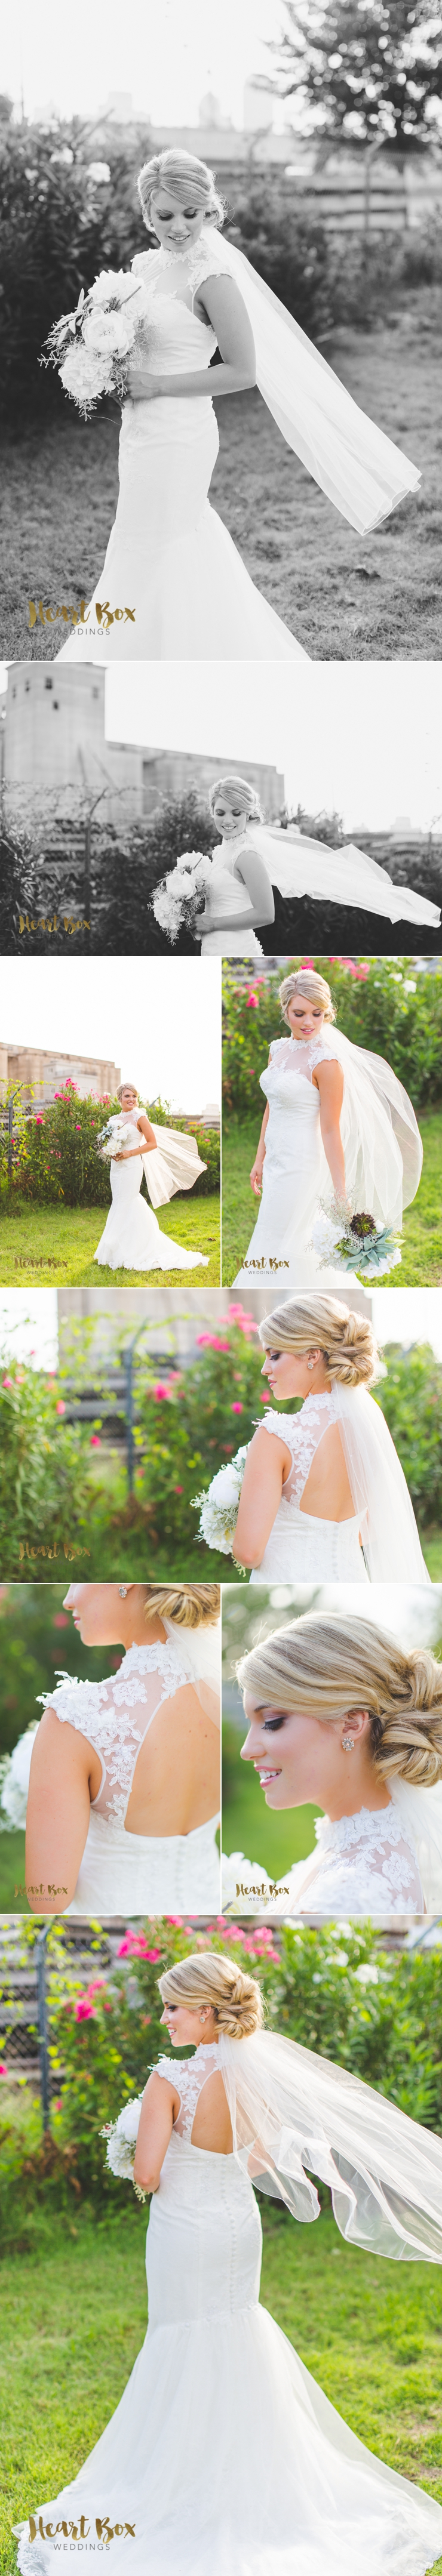 Mabry Wedding 12.jpg